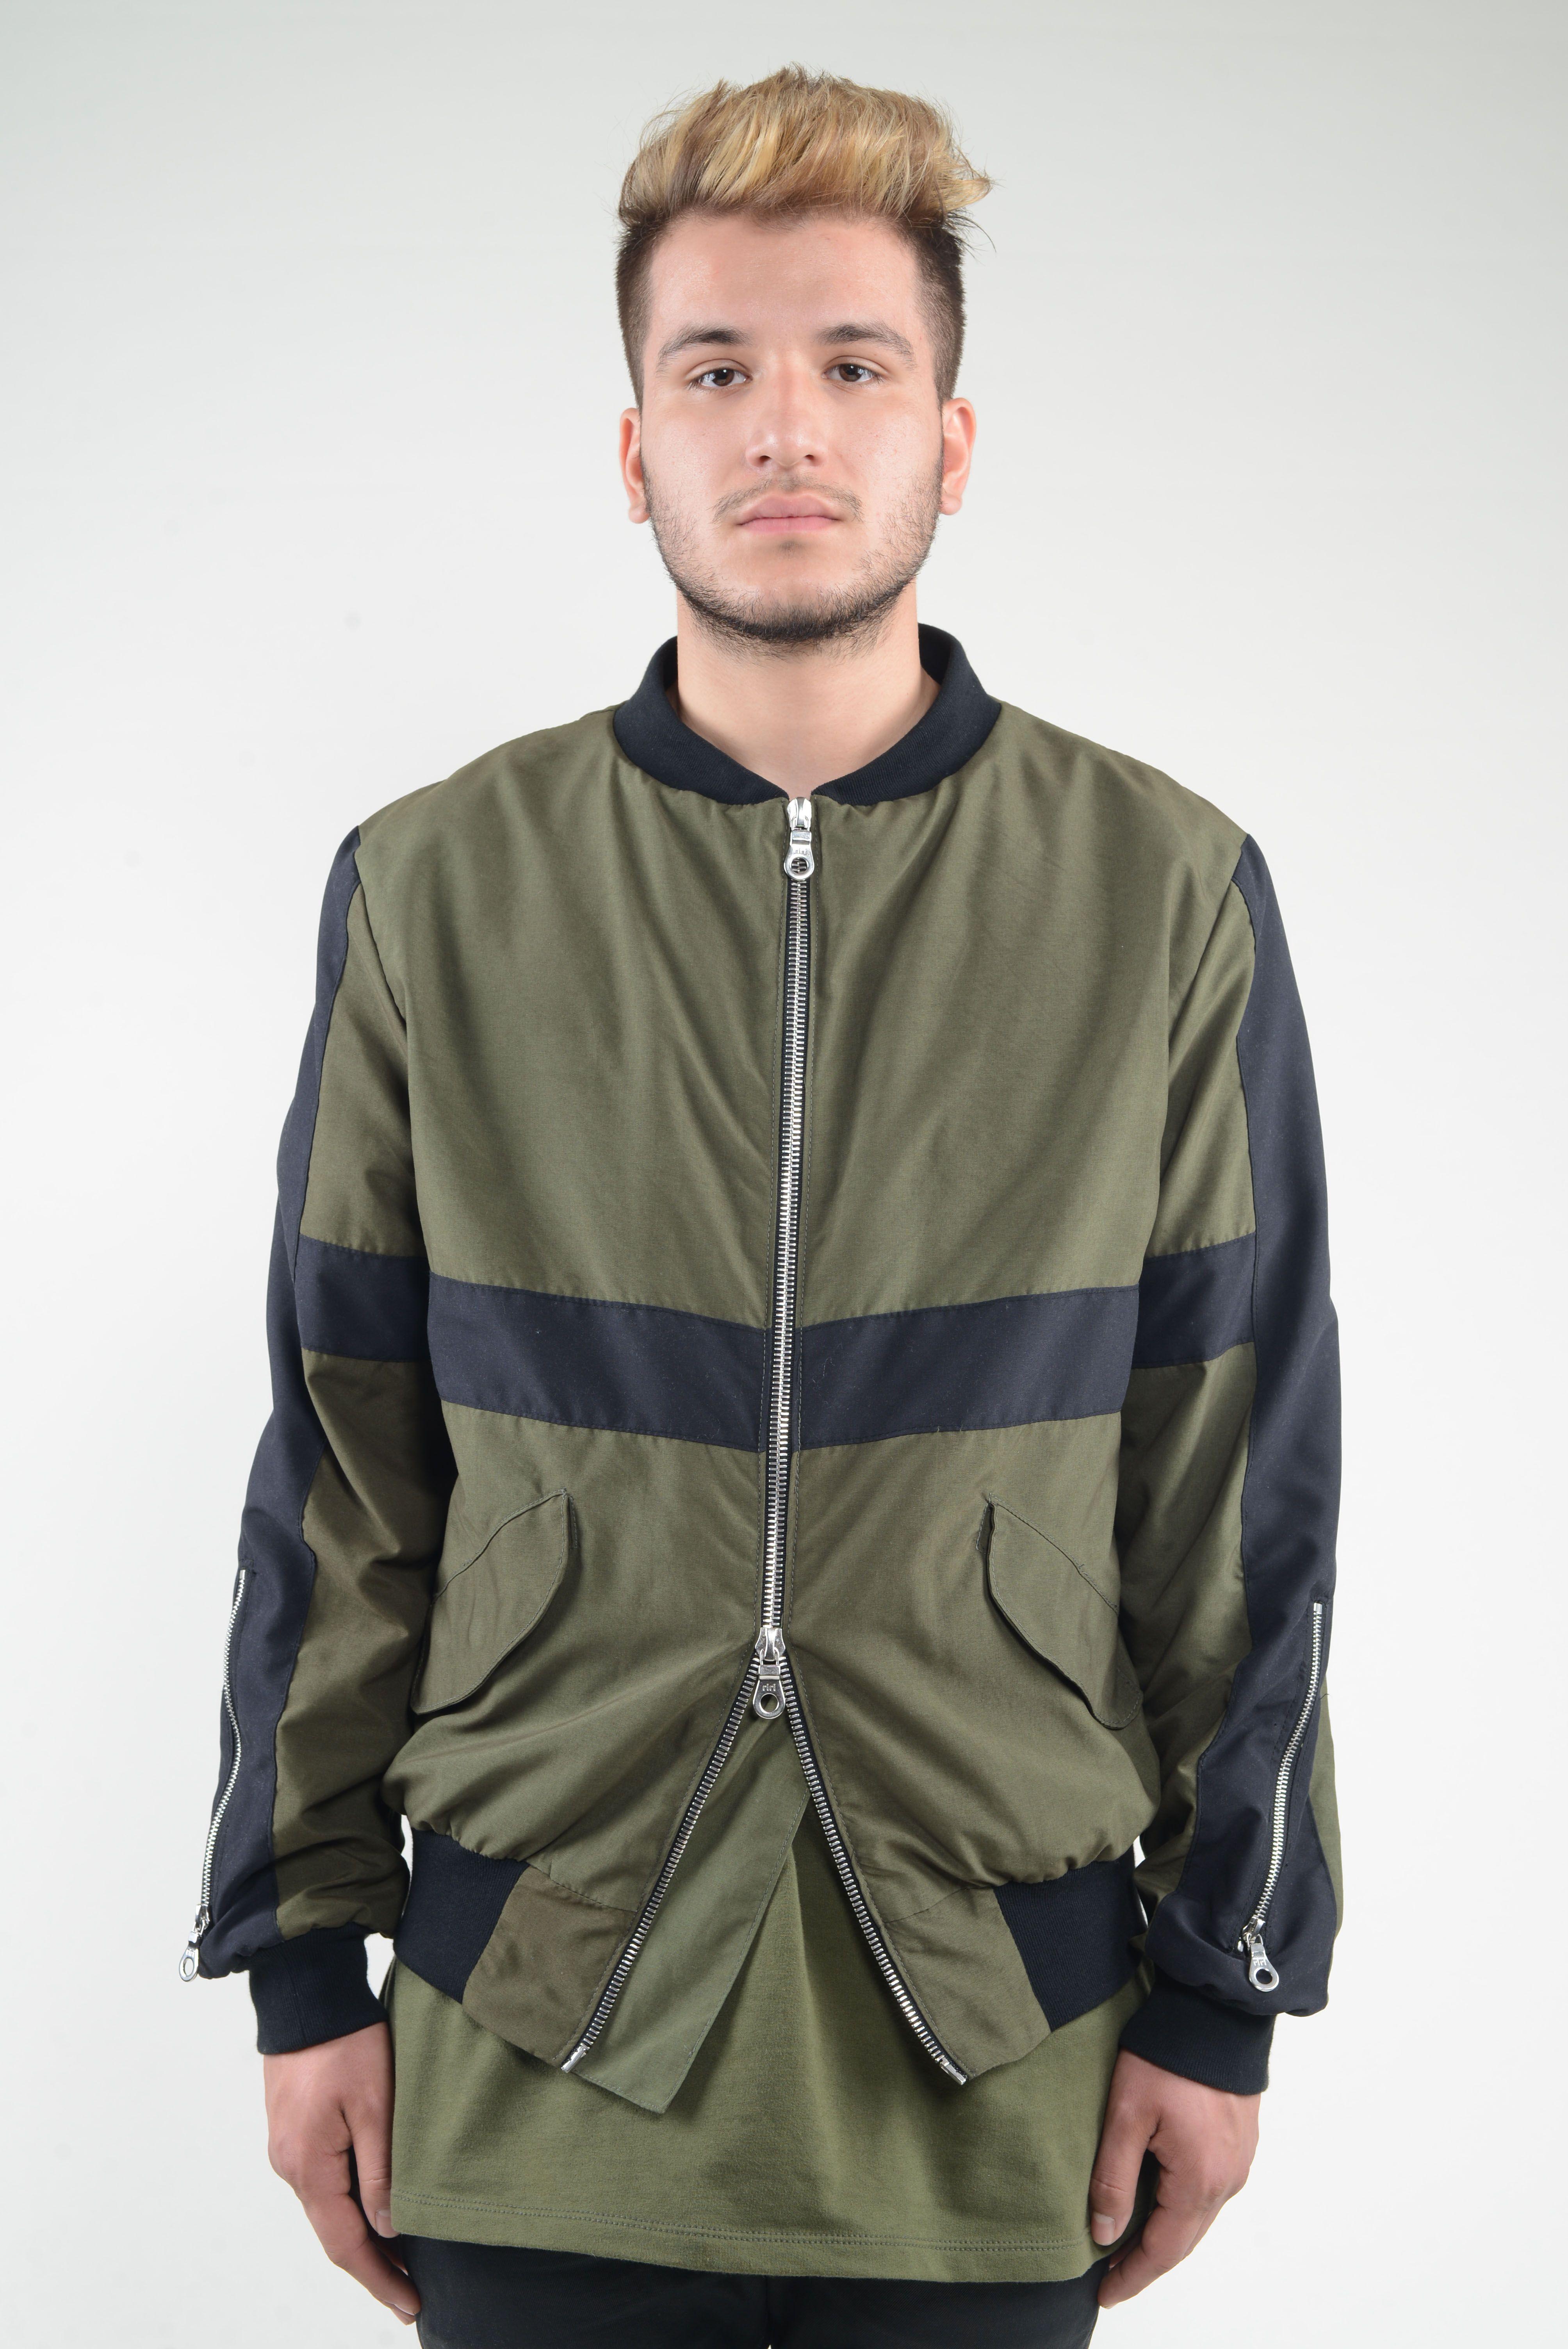 HM Bomber Jacket (Army Green) Army green bomber jacket